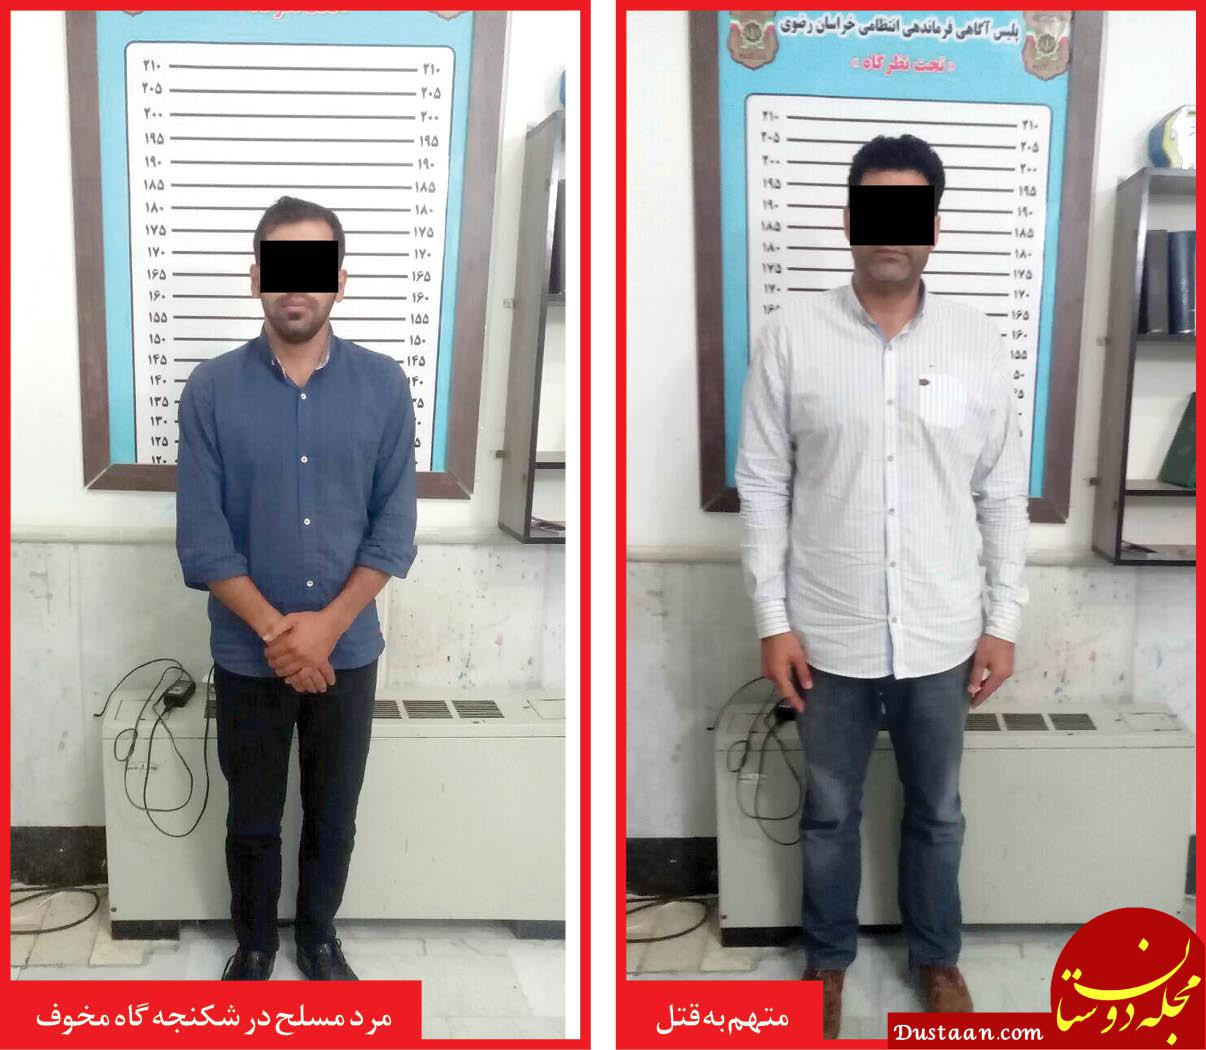 www.dustaan.com ماجرای قتل بیت کوینی در مشهد +عکس